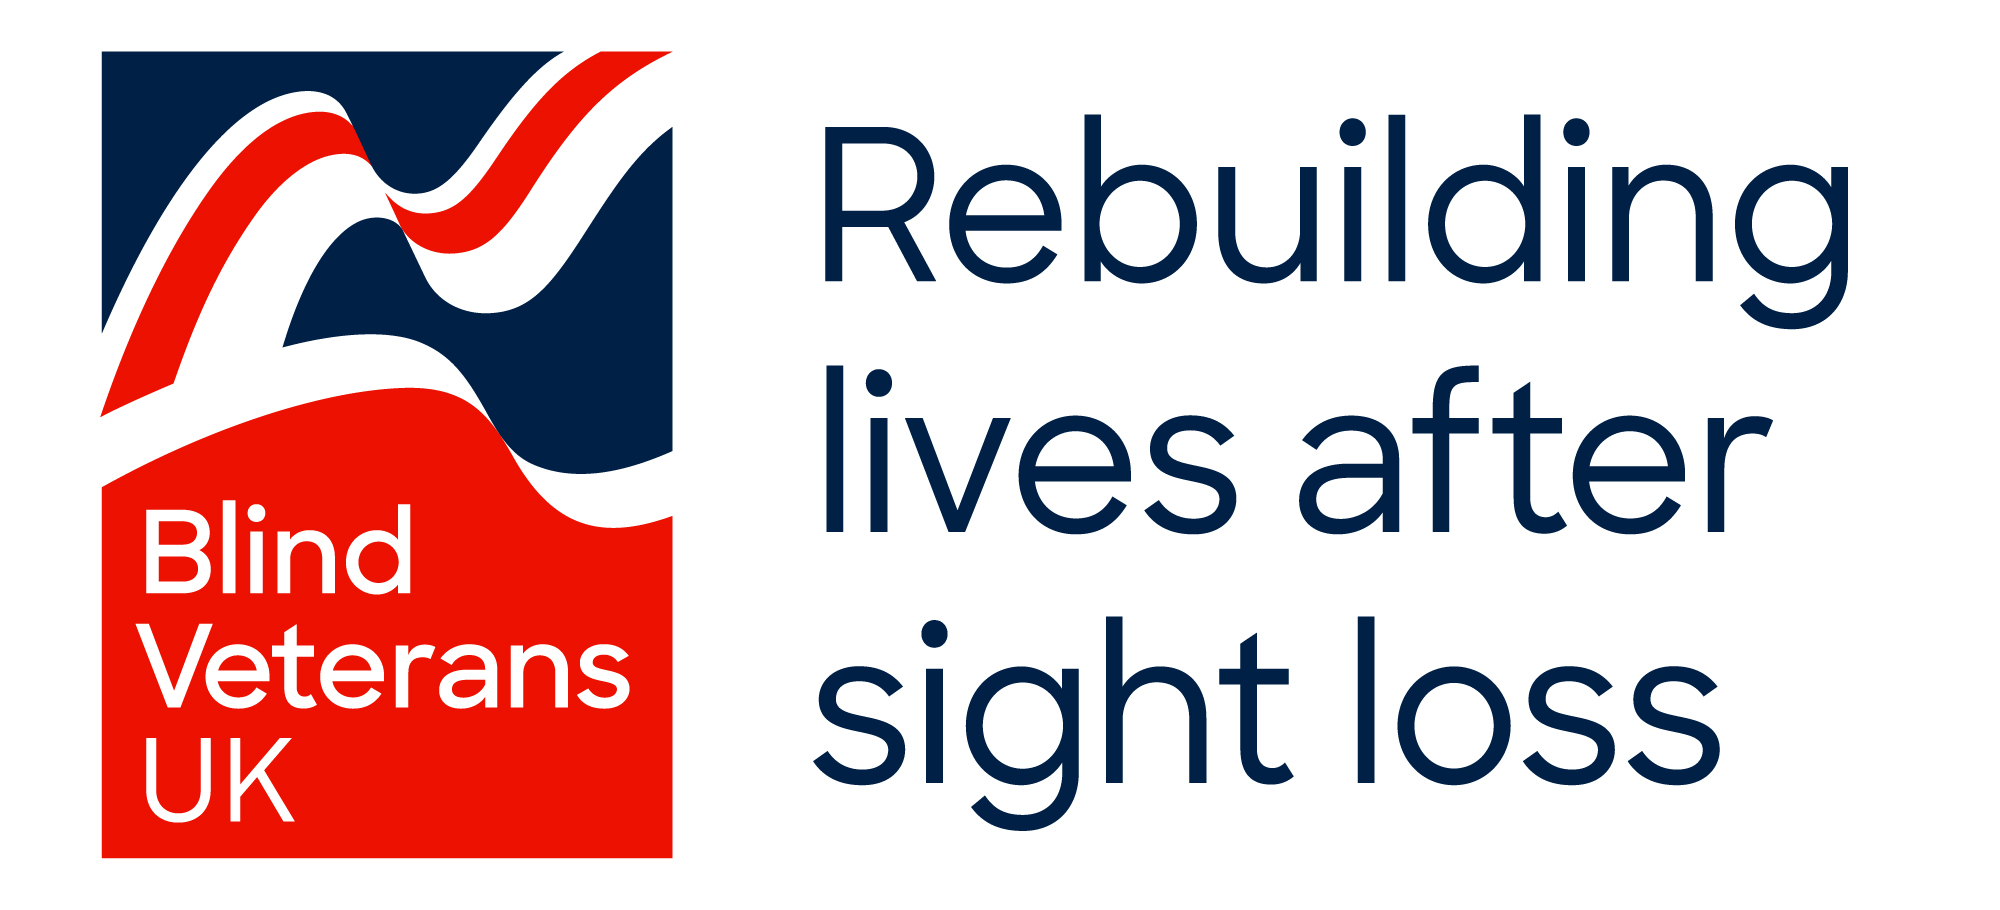 Blind Veterans UK - JustGiving